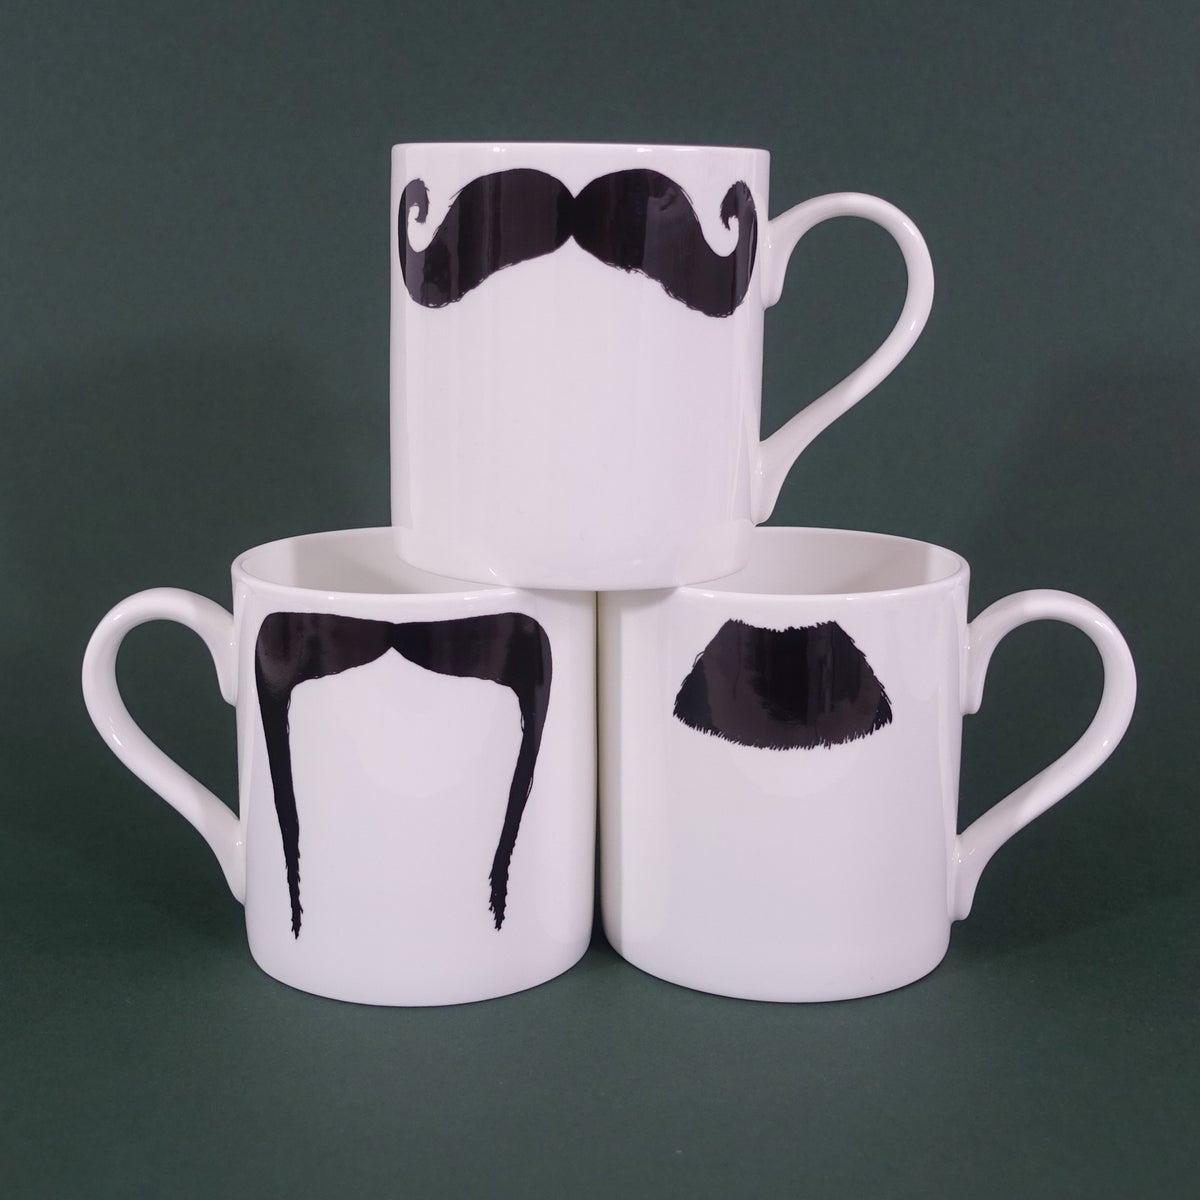 Image of Moustache Mugs Set of 3